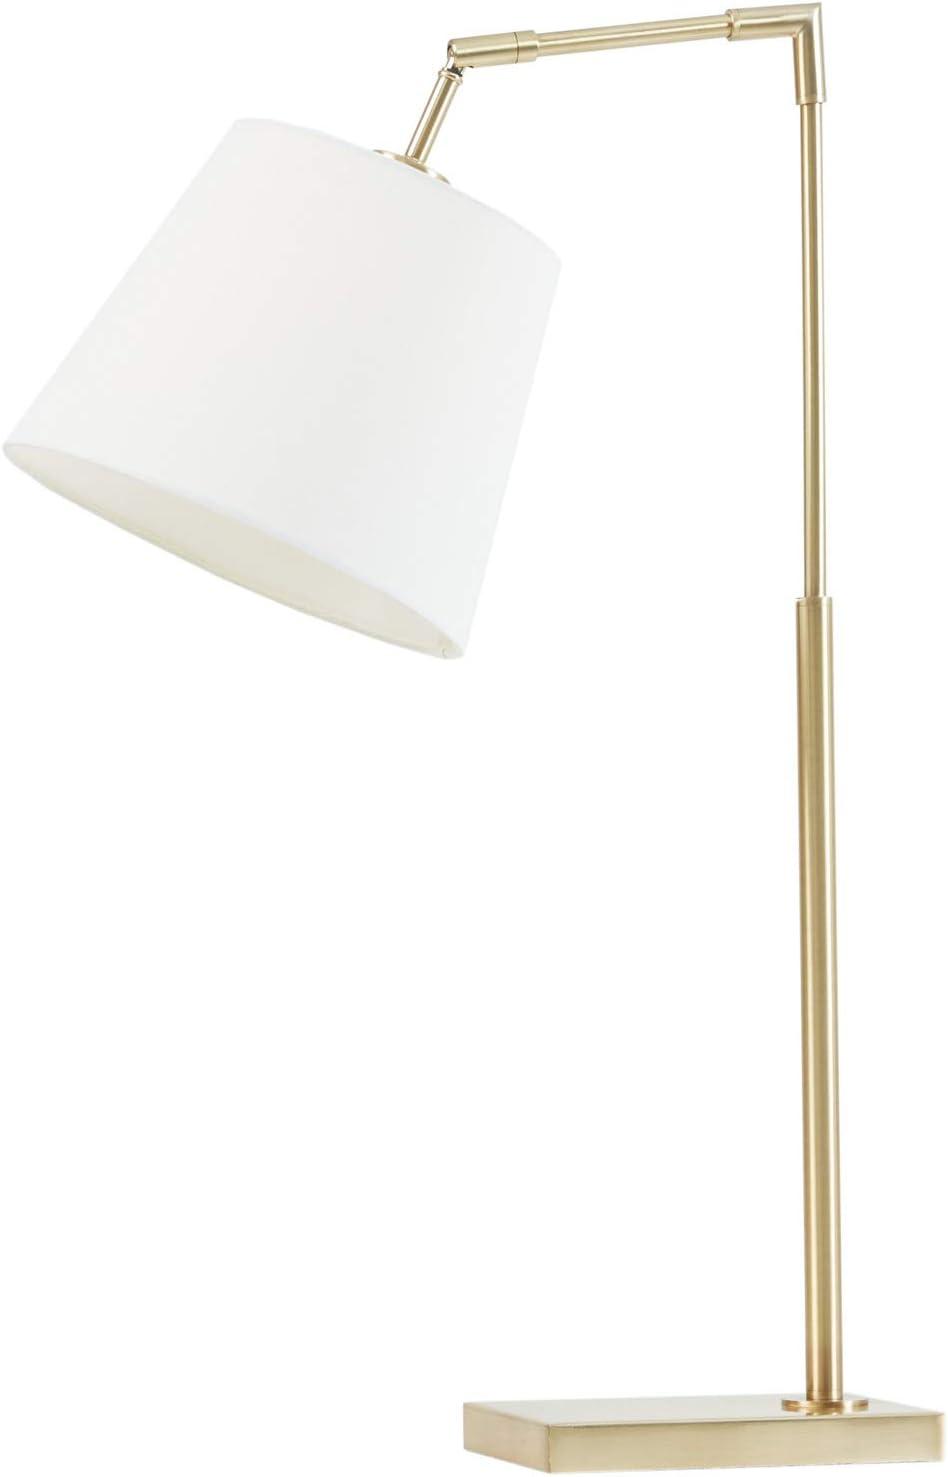 "Martha Stewart Kenley Table Lamp Living Room Decor - Angular Metal Base, Adjustable Tapered Drum Shade, Modern Home Office Desk Lighting, Nightstand Reading Light for Bedroom, 14"" X 10"" X 28.25"""